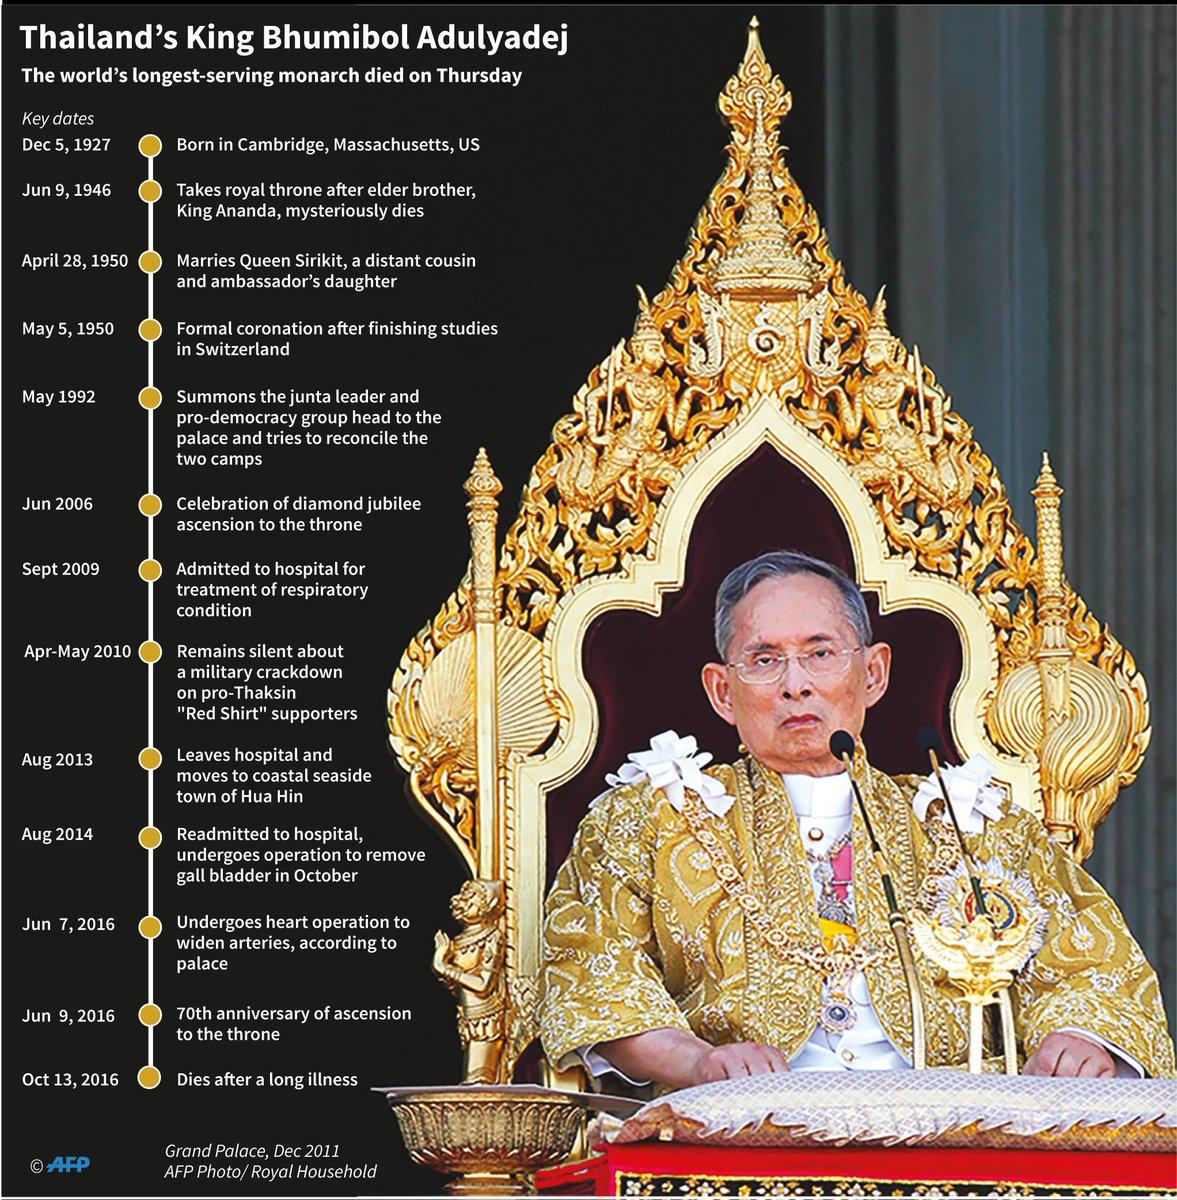 #KingBhumibol: Key dates during his reign https://t.co/fGGSlNlxNr https://t.co/ubOhspiEb3